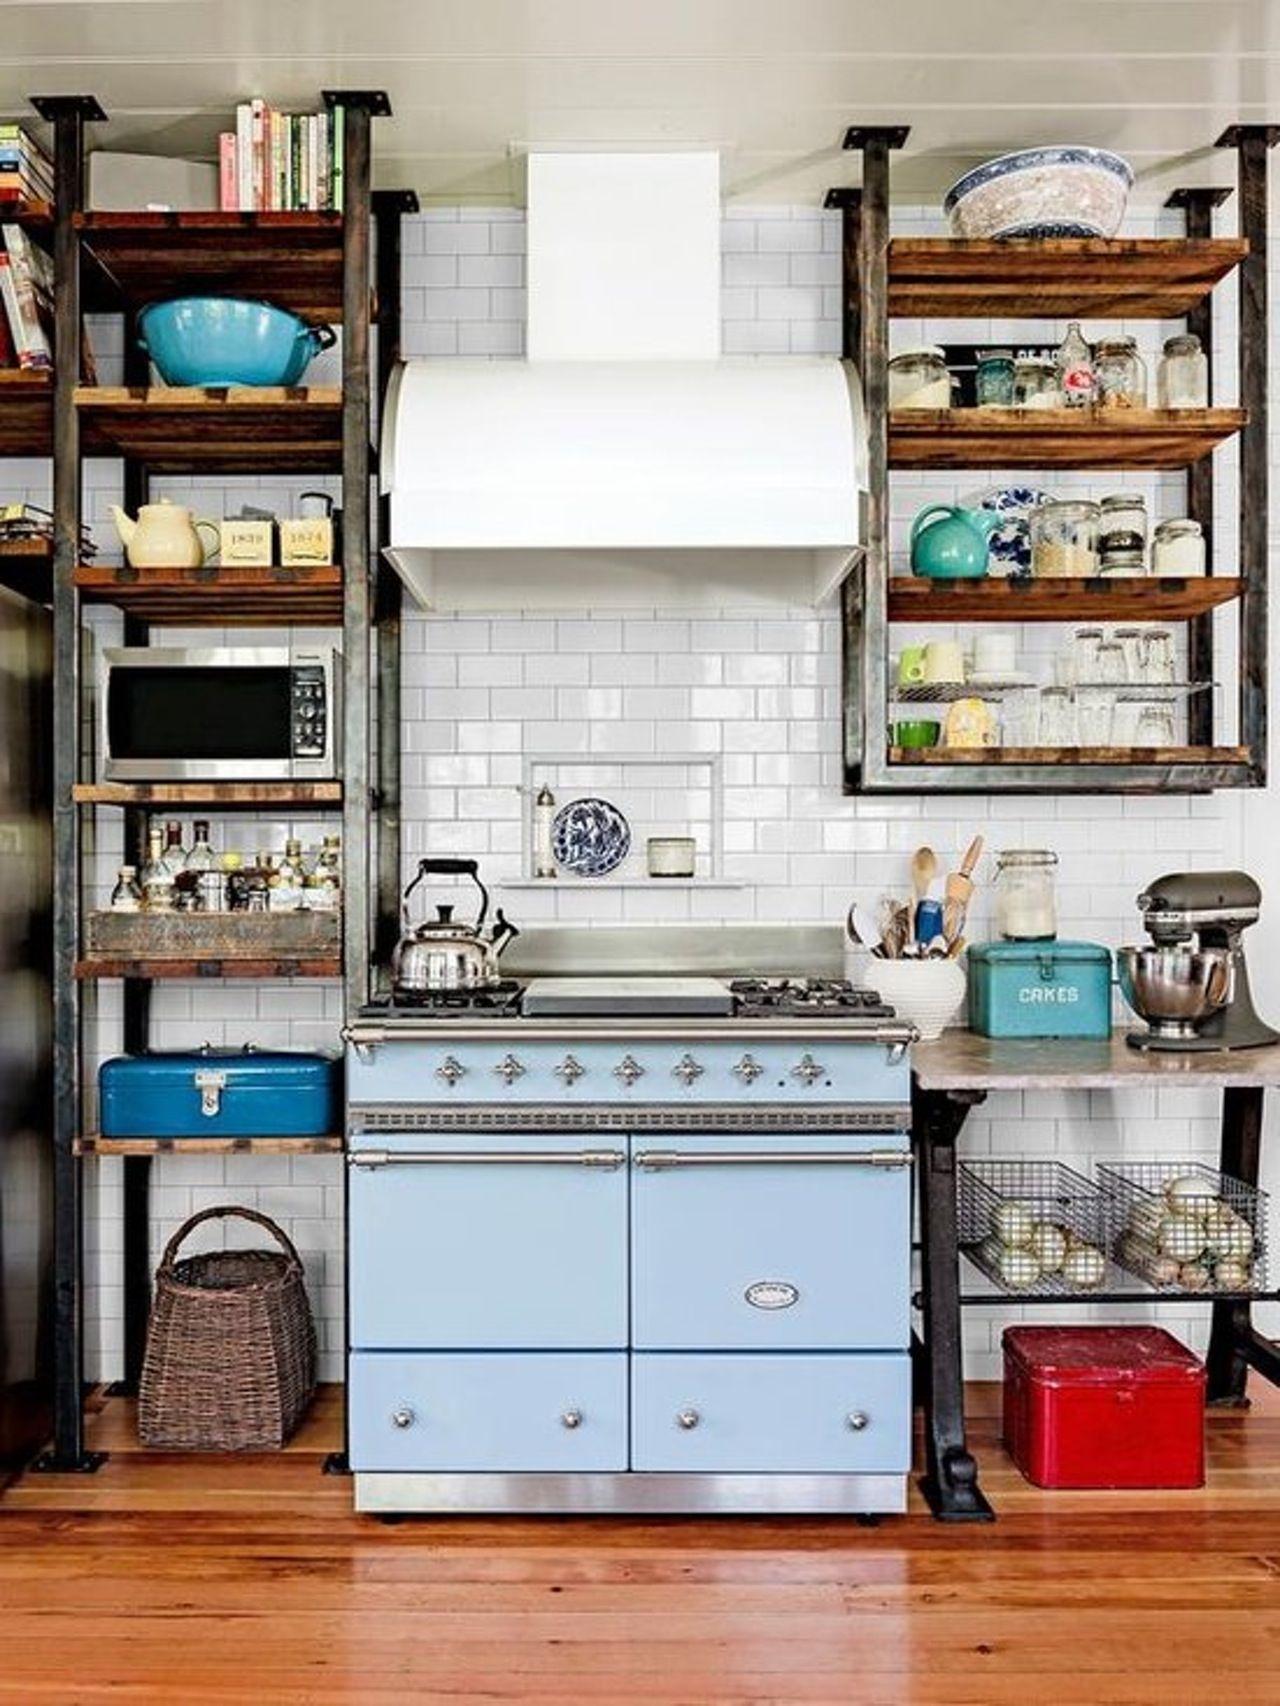 Messy Cool 9 Bohemian Kitchens   Quirky kitchen, Kitchen design ...